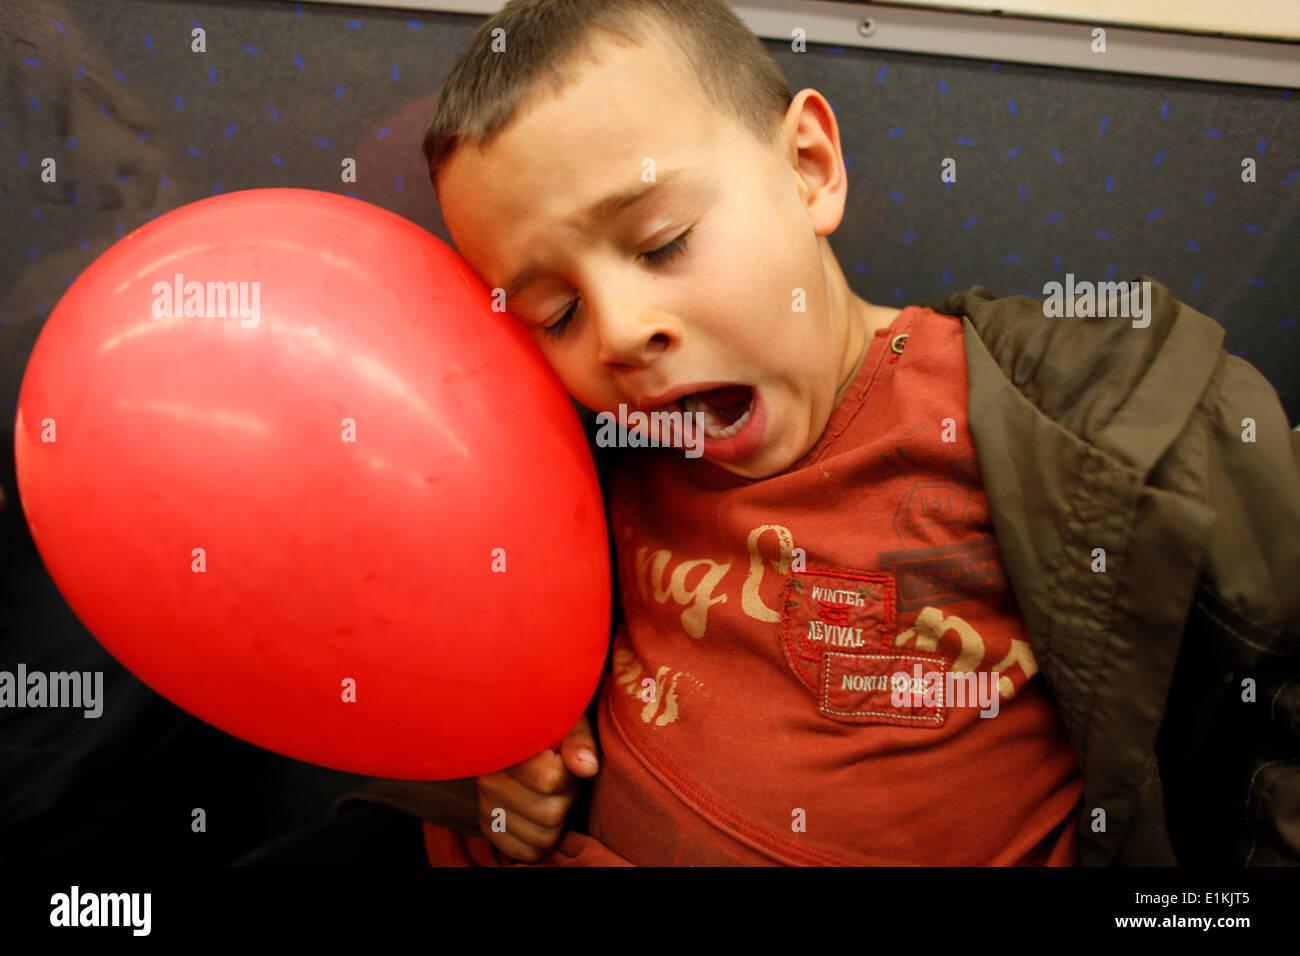 5-year-old boy falling asleep in public transport - Stock Image